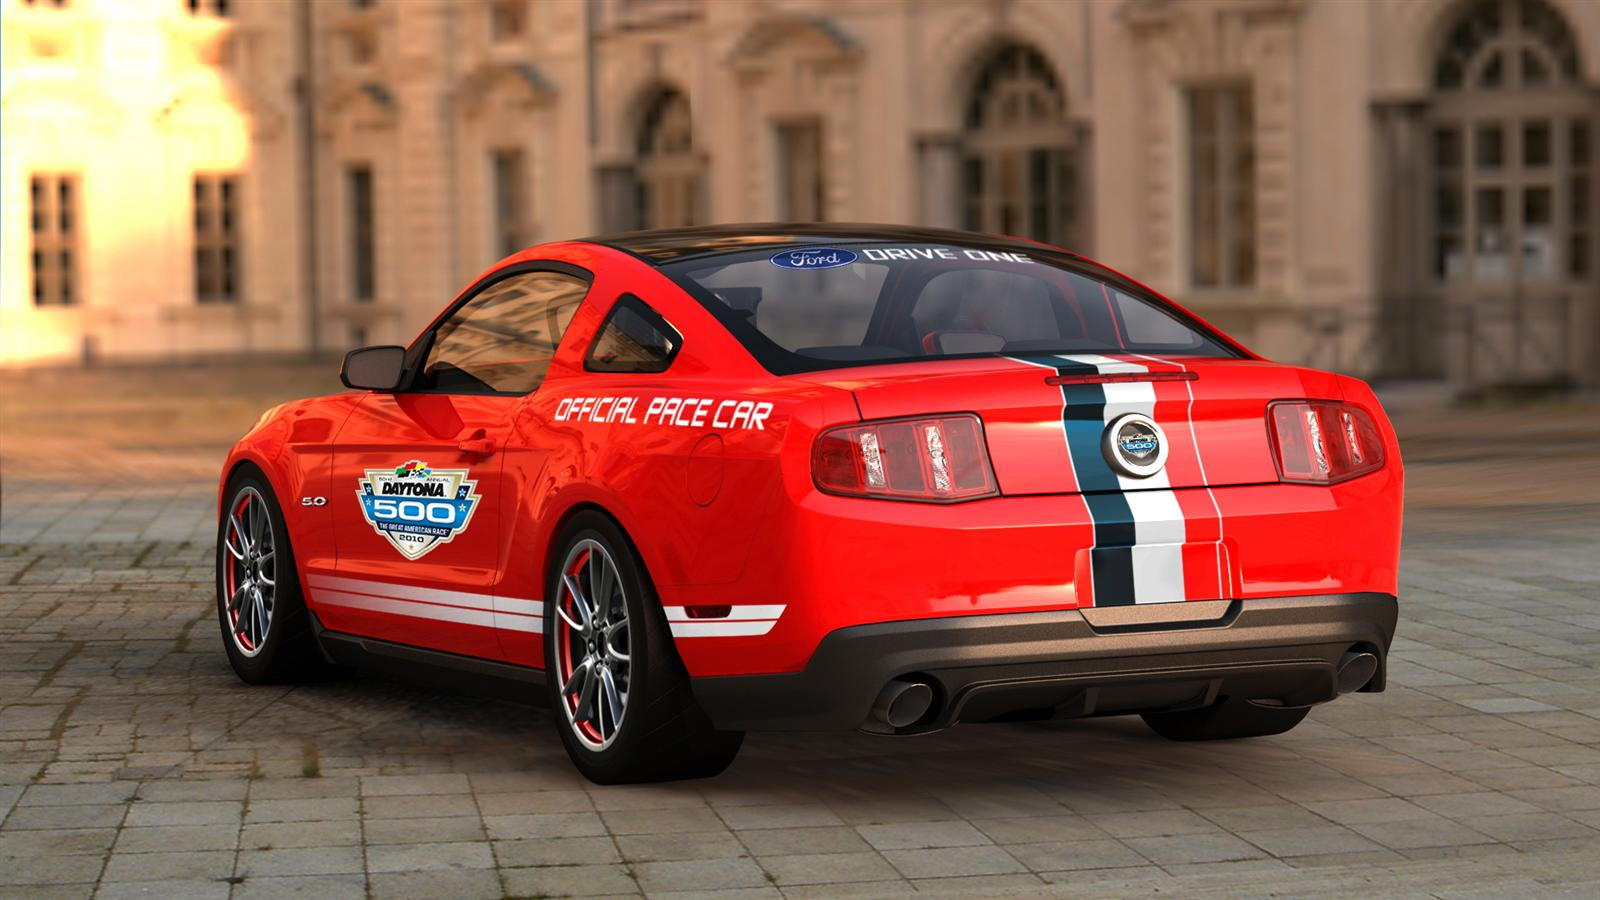 2011 Mustang GT Daytona Pace Car